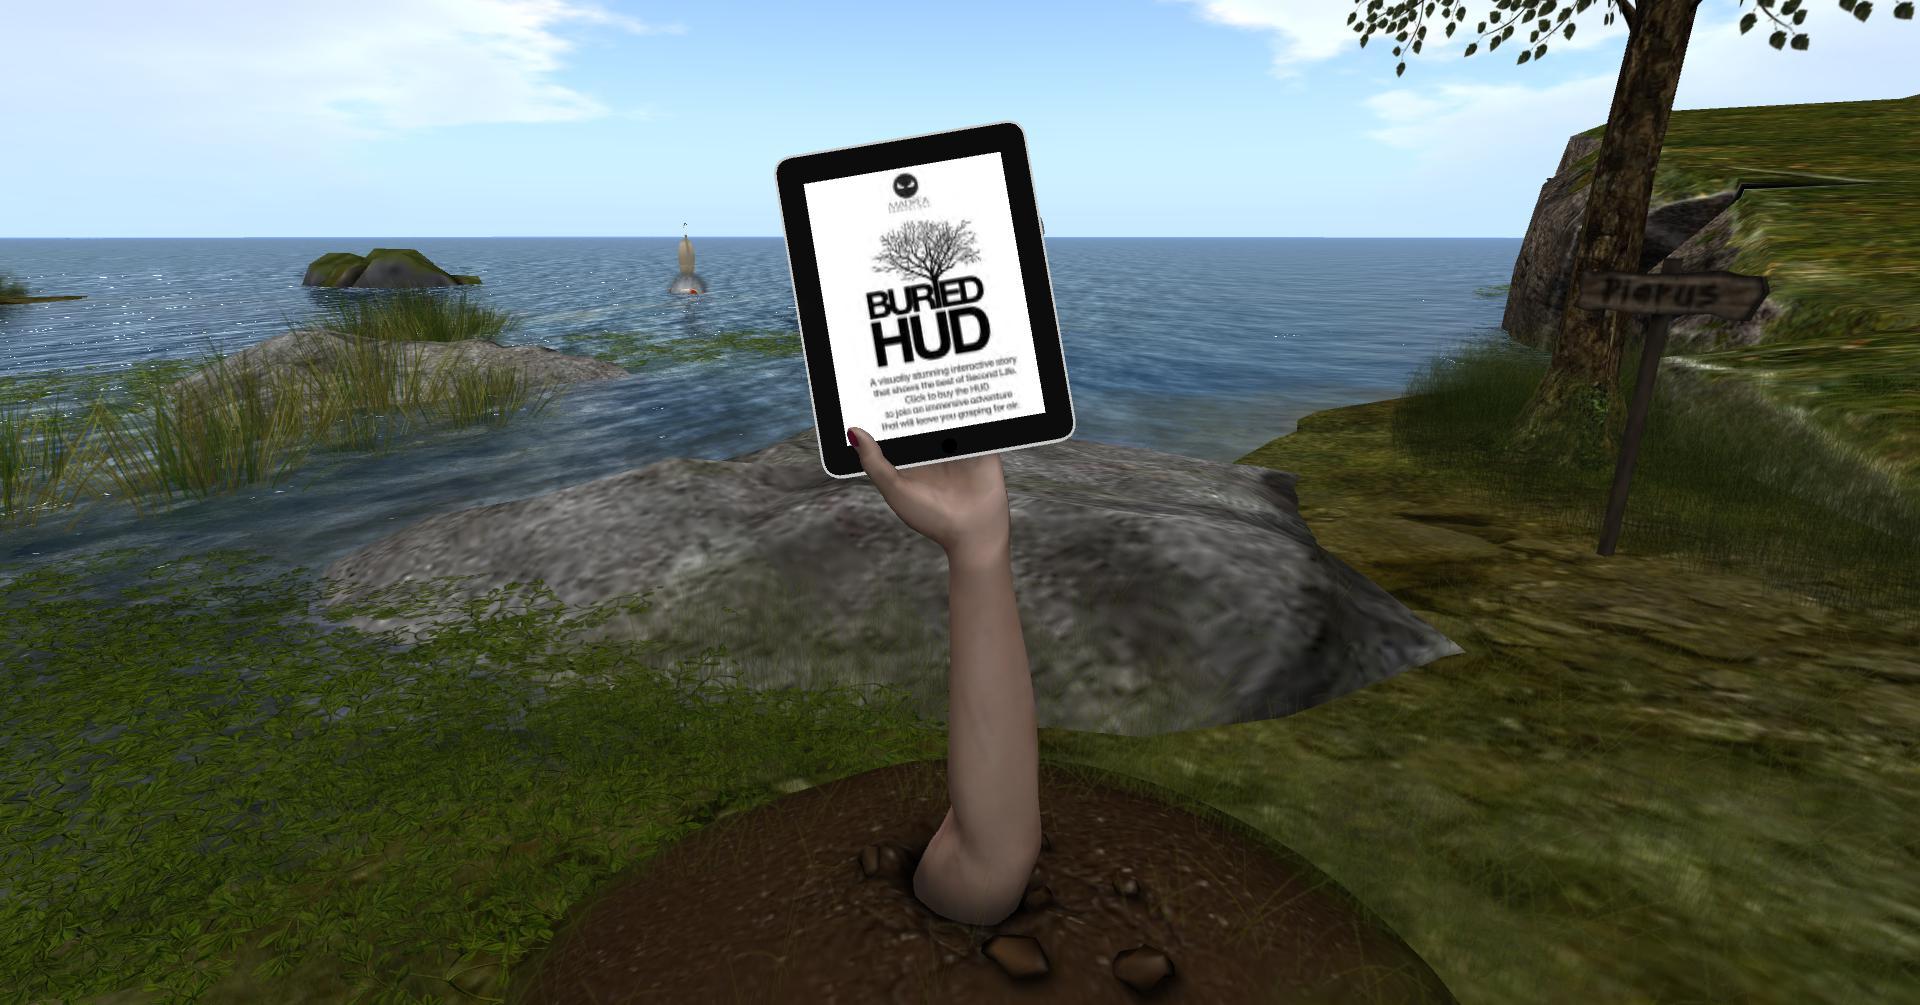 Buried hud_001